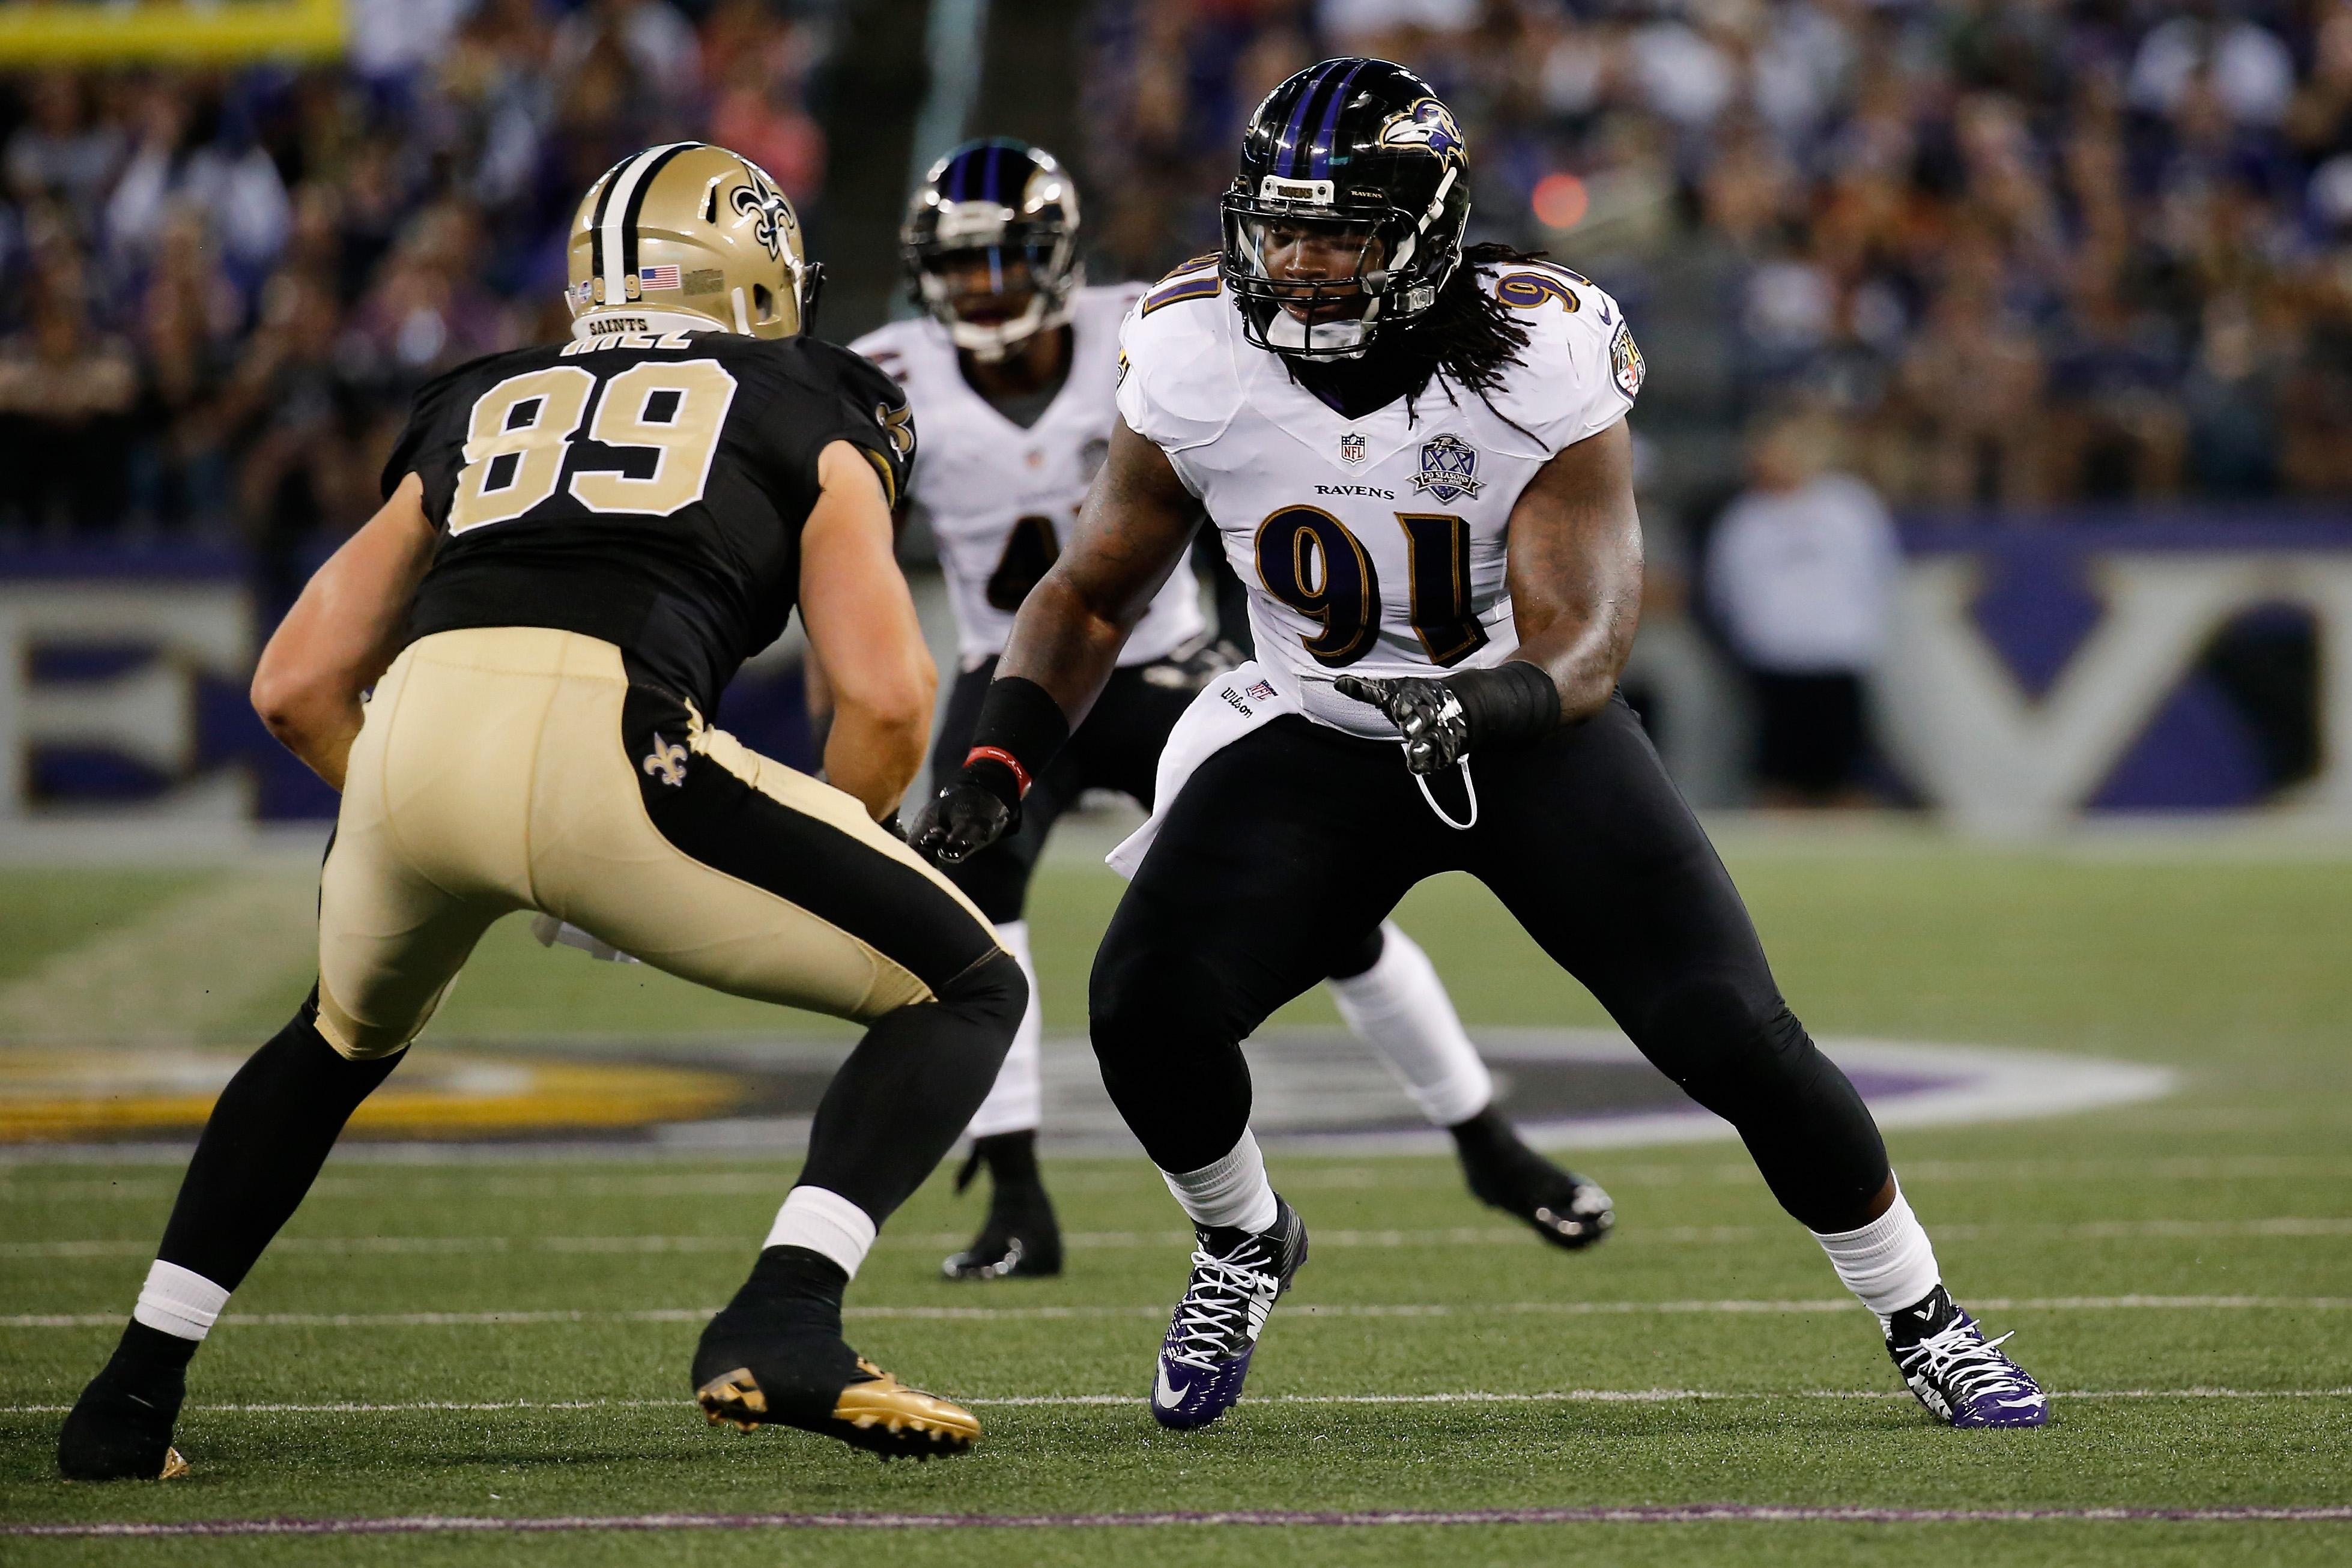 Ravens 'B' team outlasts Saints 'B' team, 17-14, in PS1